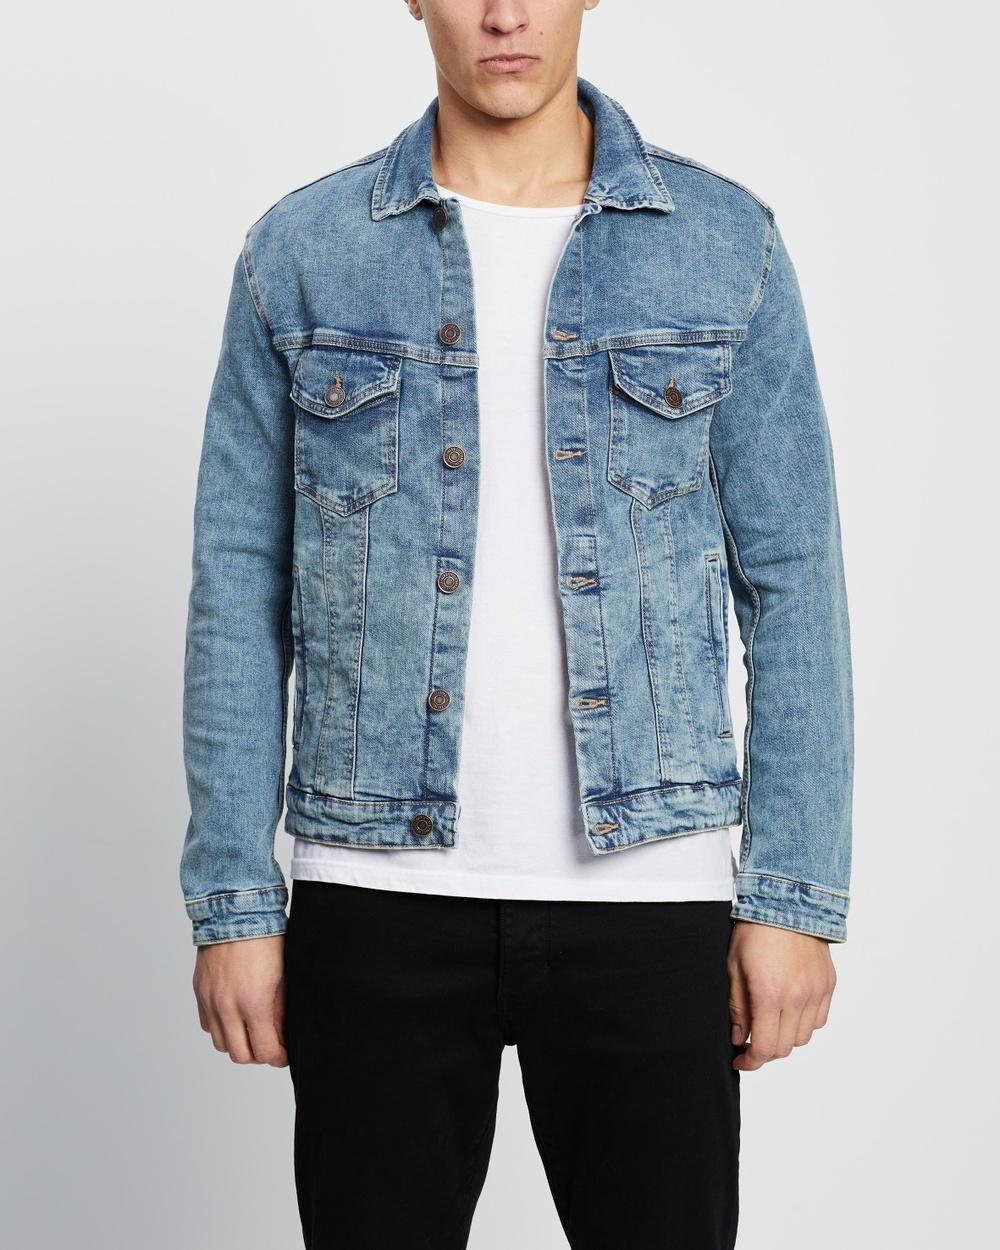 Jack & Jones Alvin Denim Jacket jacket Blue Denim Australia